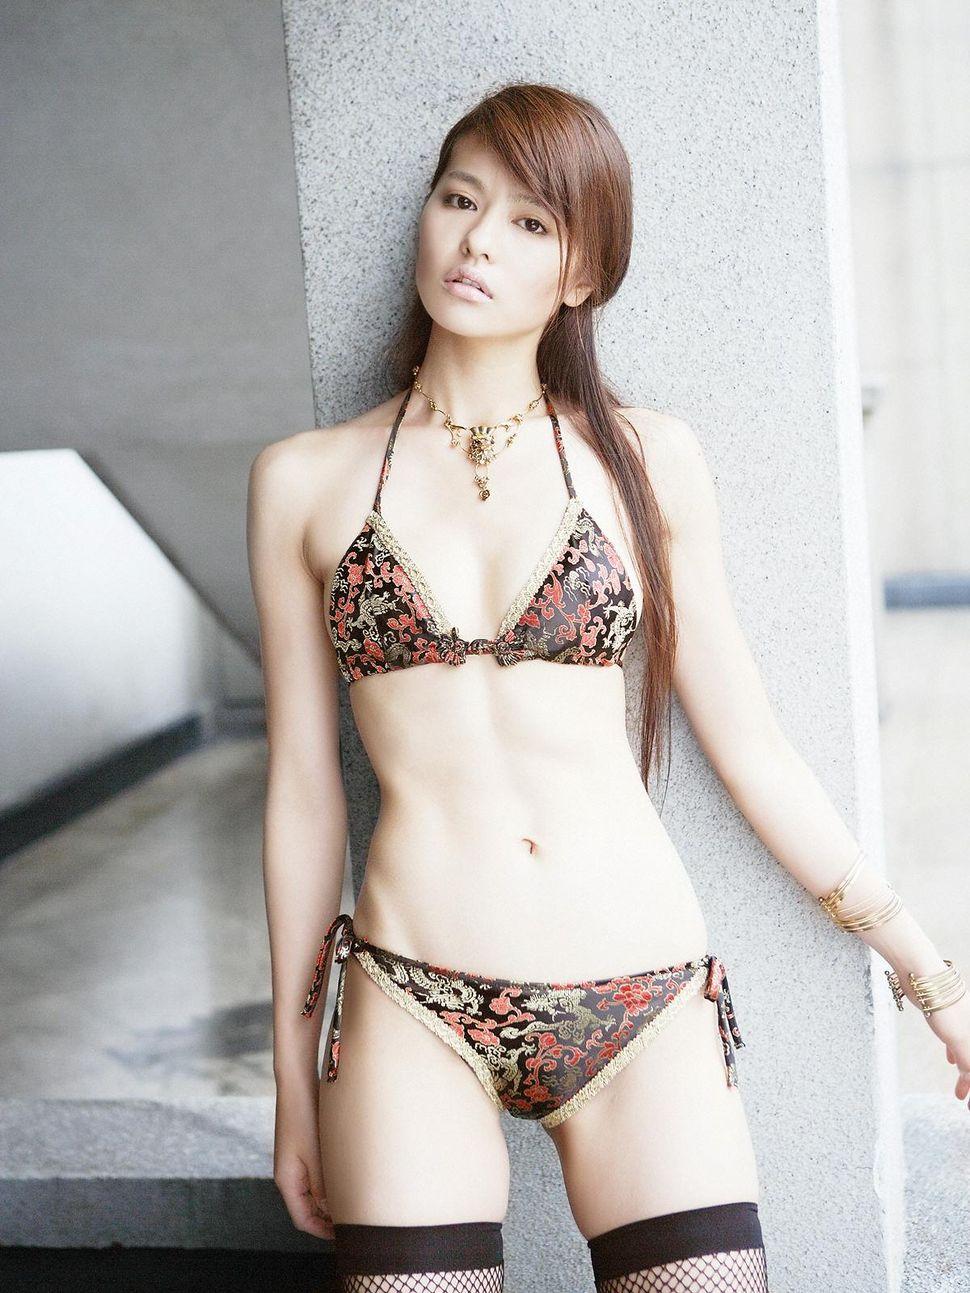 http://file.embraer170.blog.shinobi.jp/20110128syur3big19.jpg